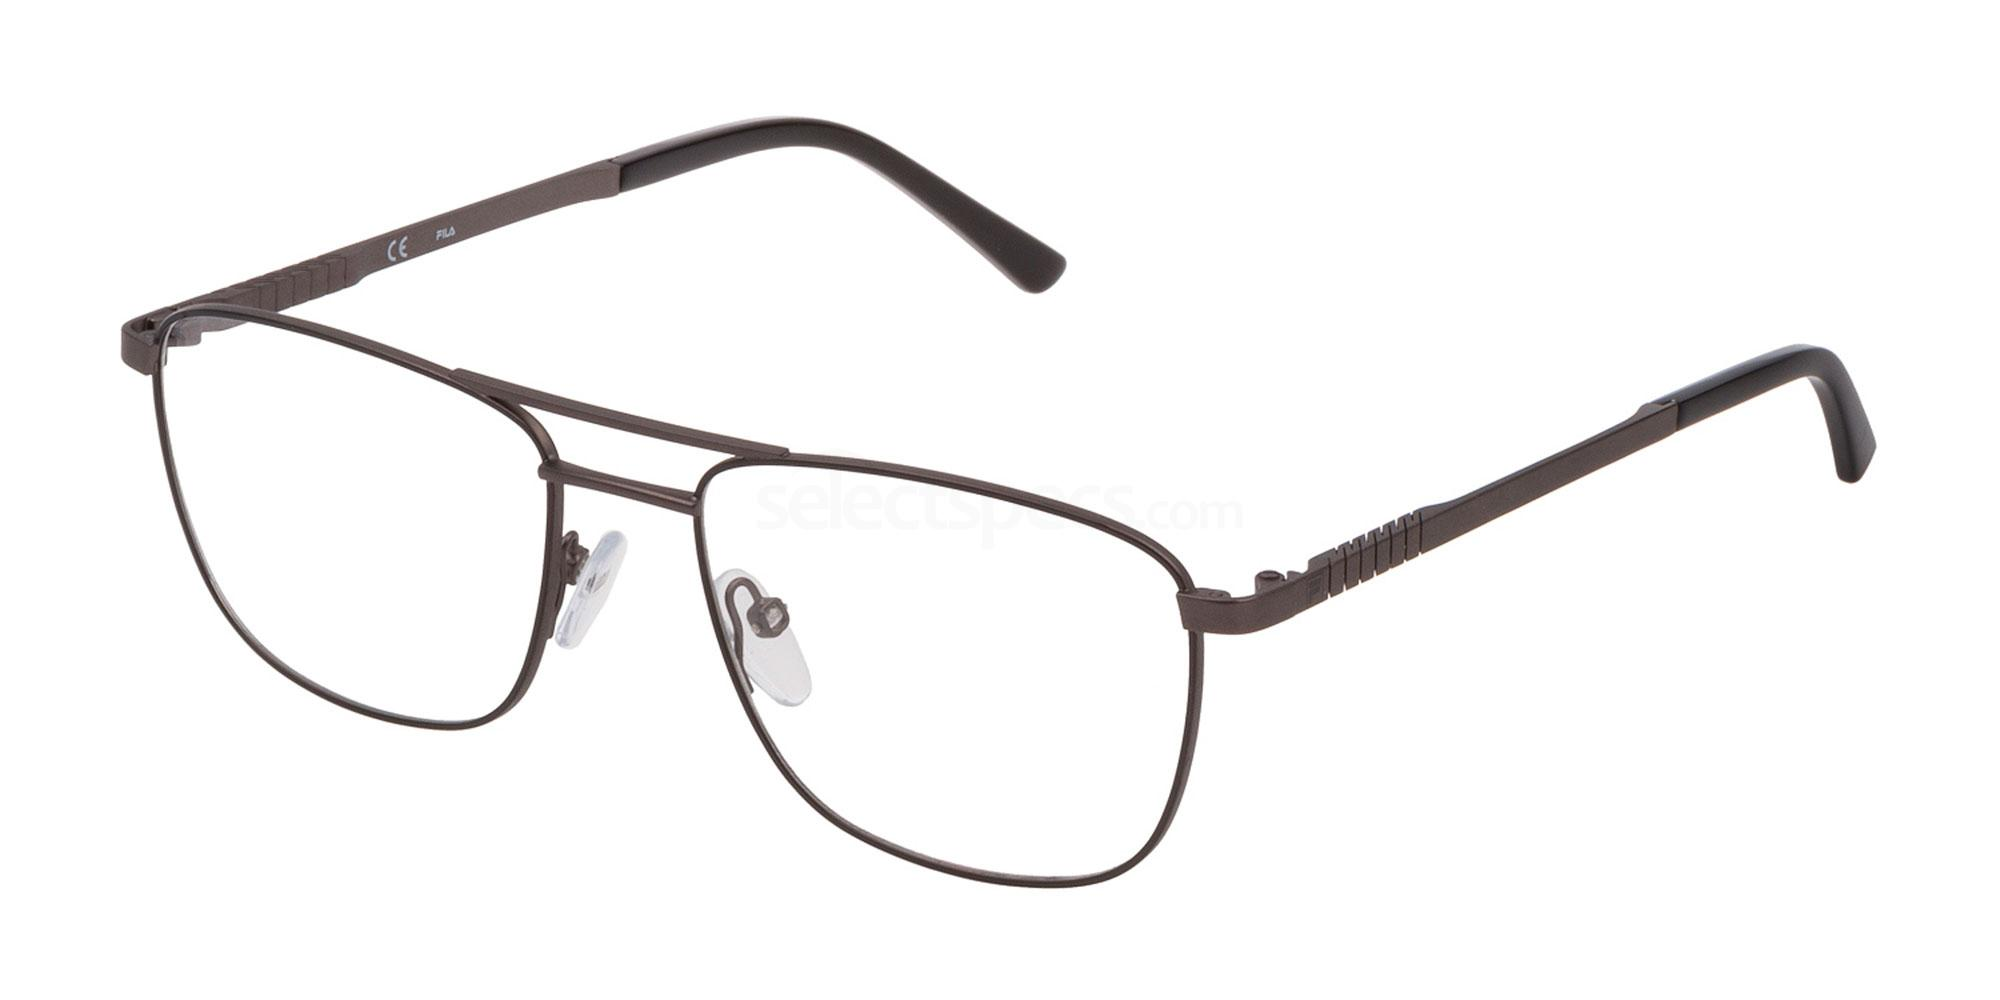 08Y8 VF9941 Glasses, Fila